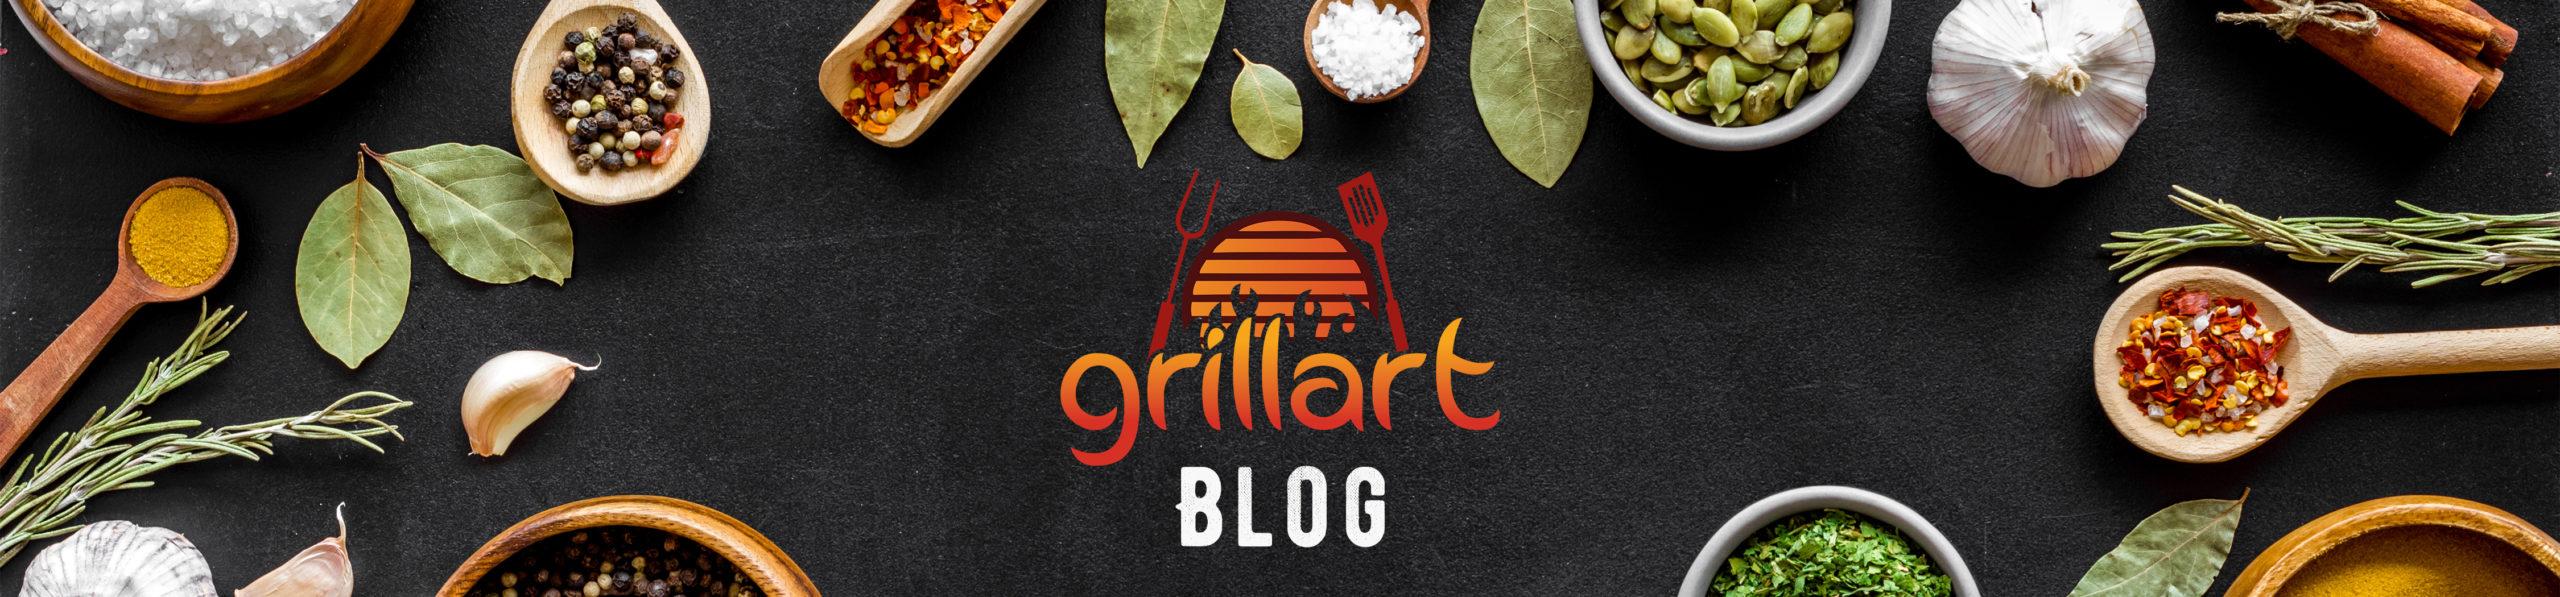 Grillart Blog